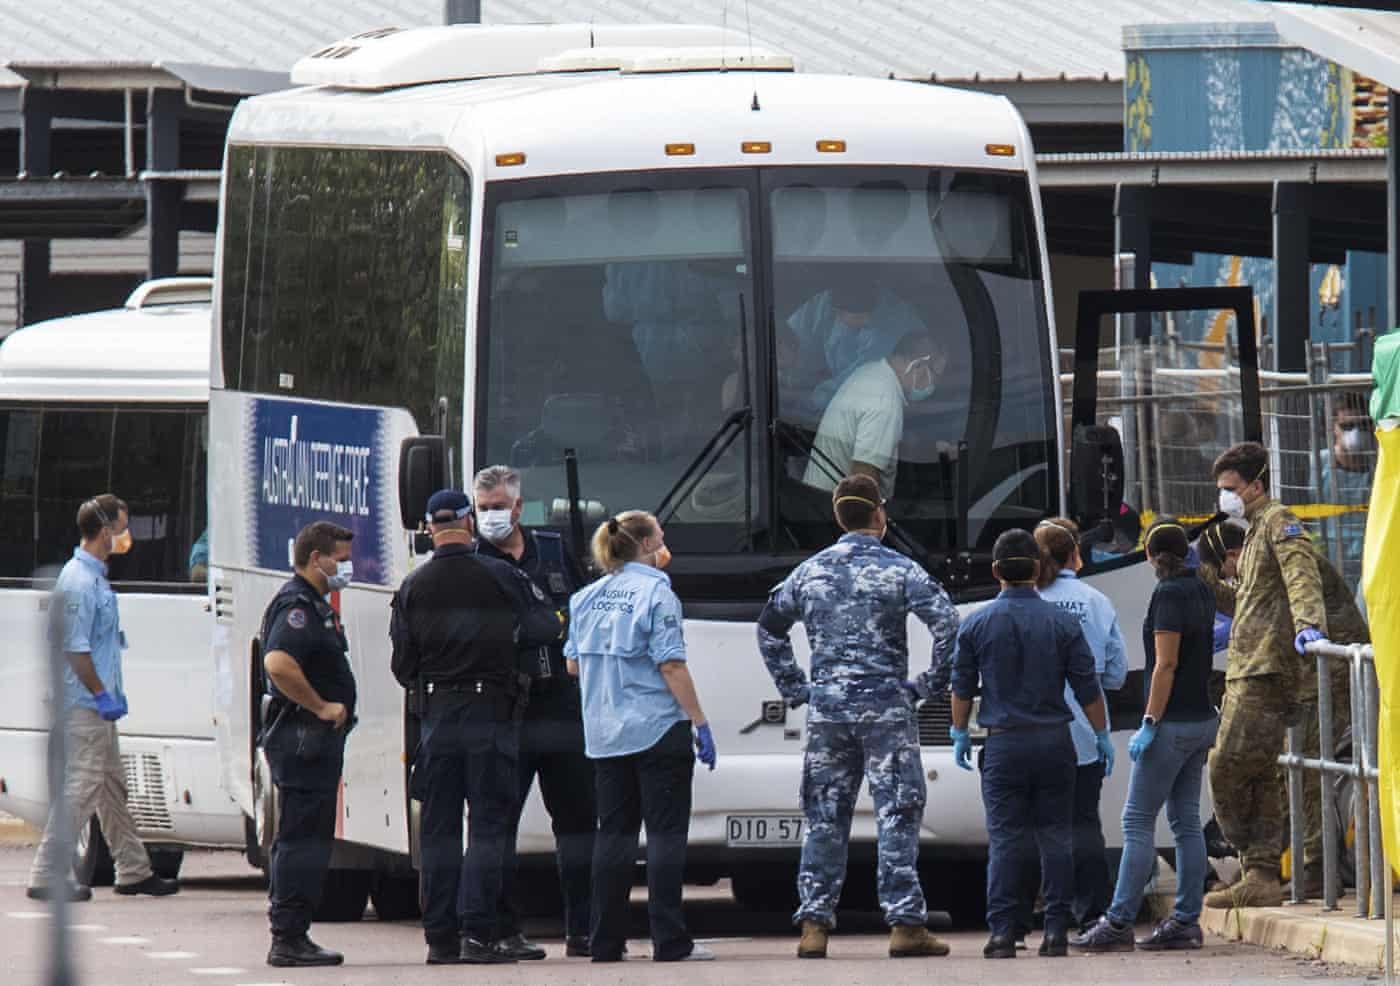 Coronavirus: two more Australians evacuated from Diamond Princess test positive